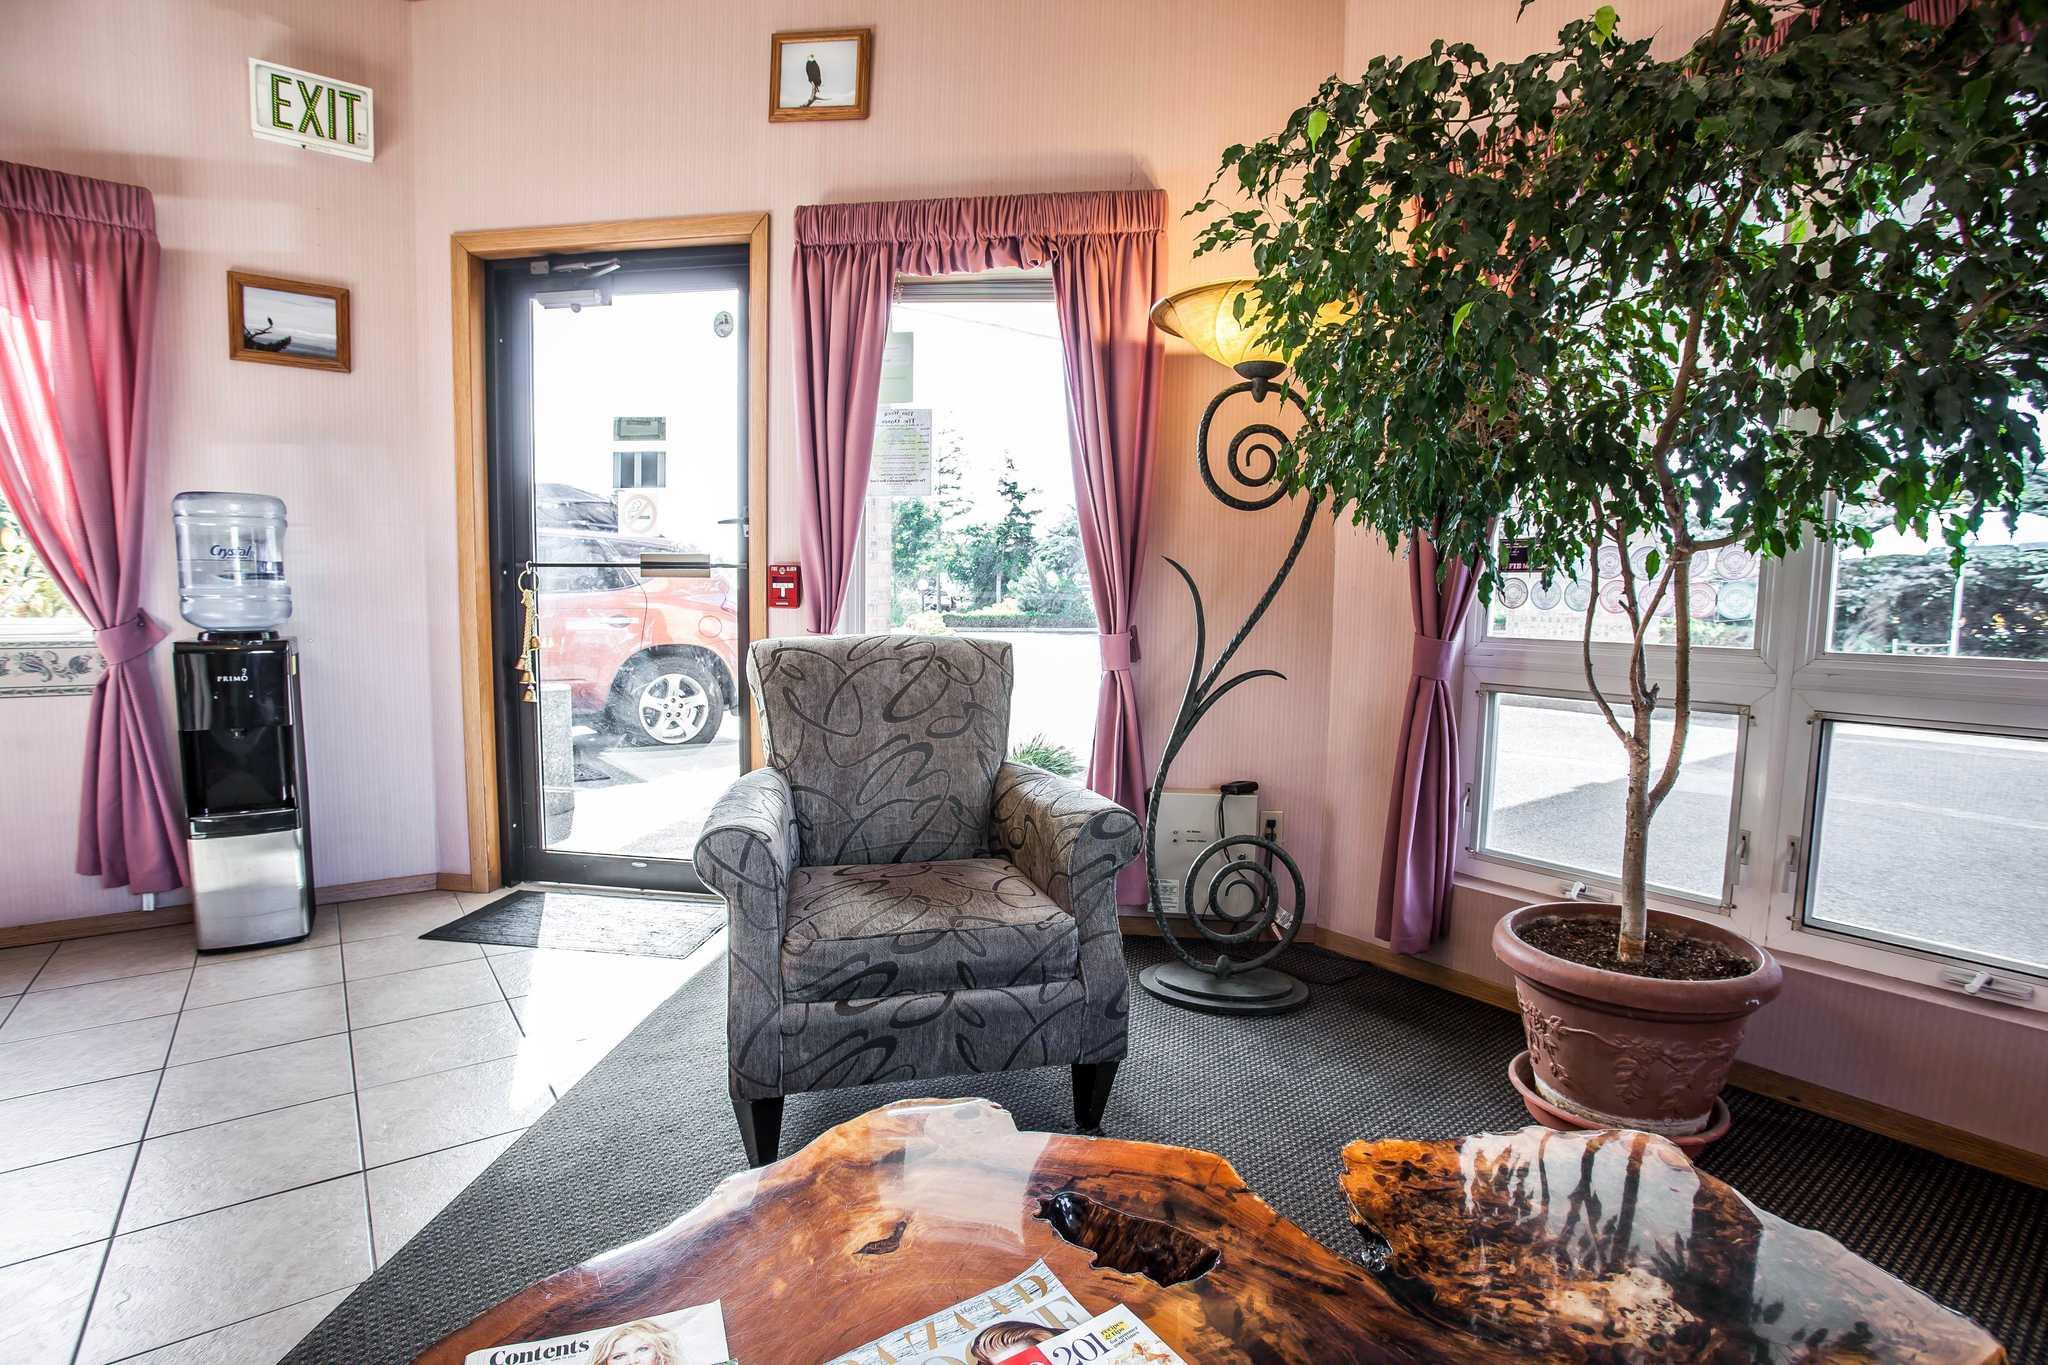 Econo Lodge image 26